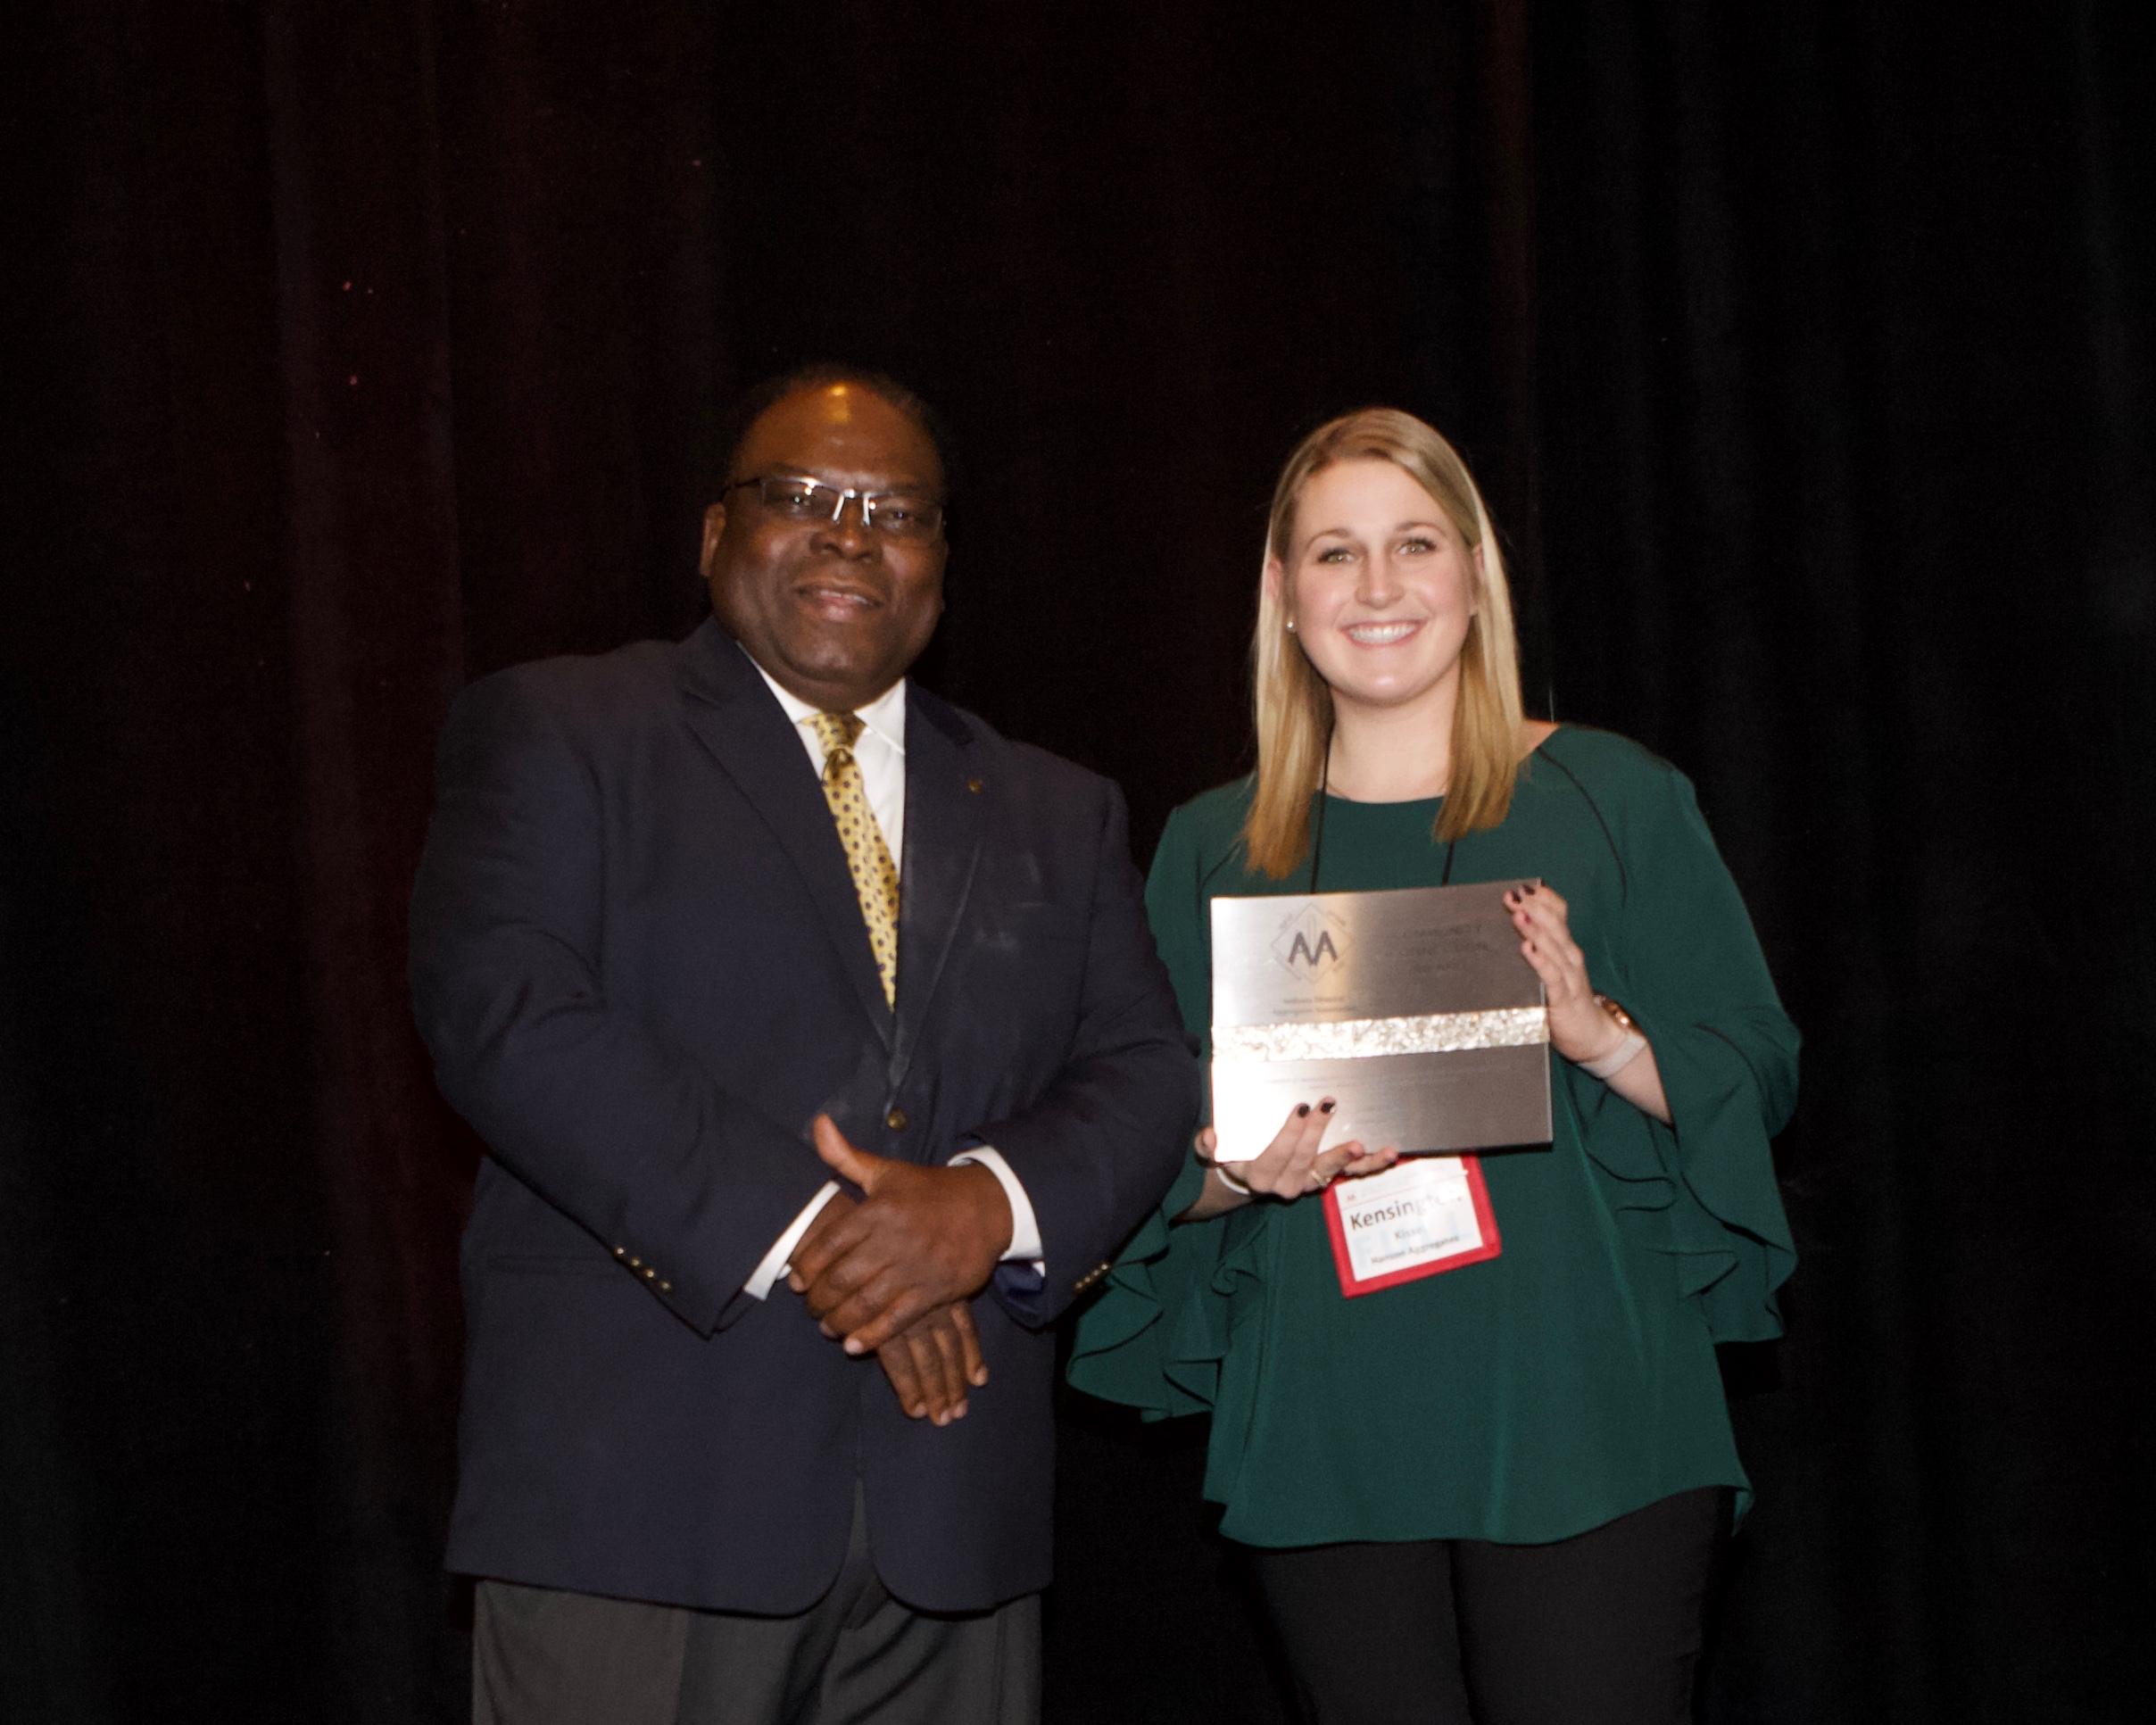 2020 IMAA Awards - Community Connection Award